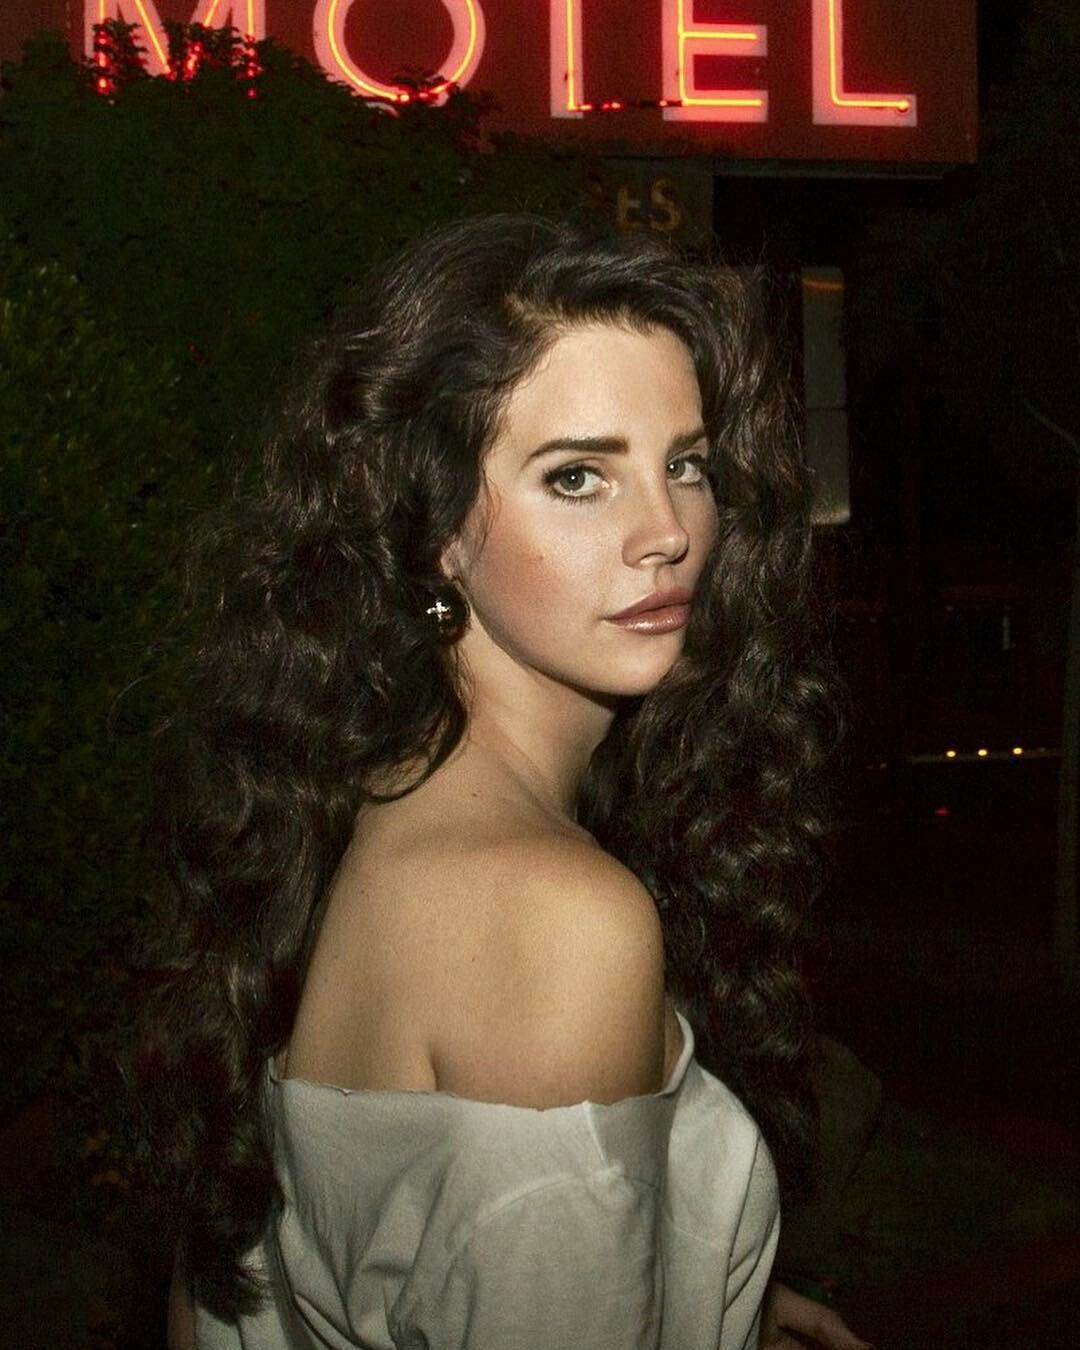 Lana Del Rey Small Curls Hair Side Part Dark Brown Lipstick In 2020 Lana Del Rey Hair Hair Inspiration Lana Del Rey Love